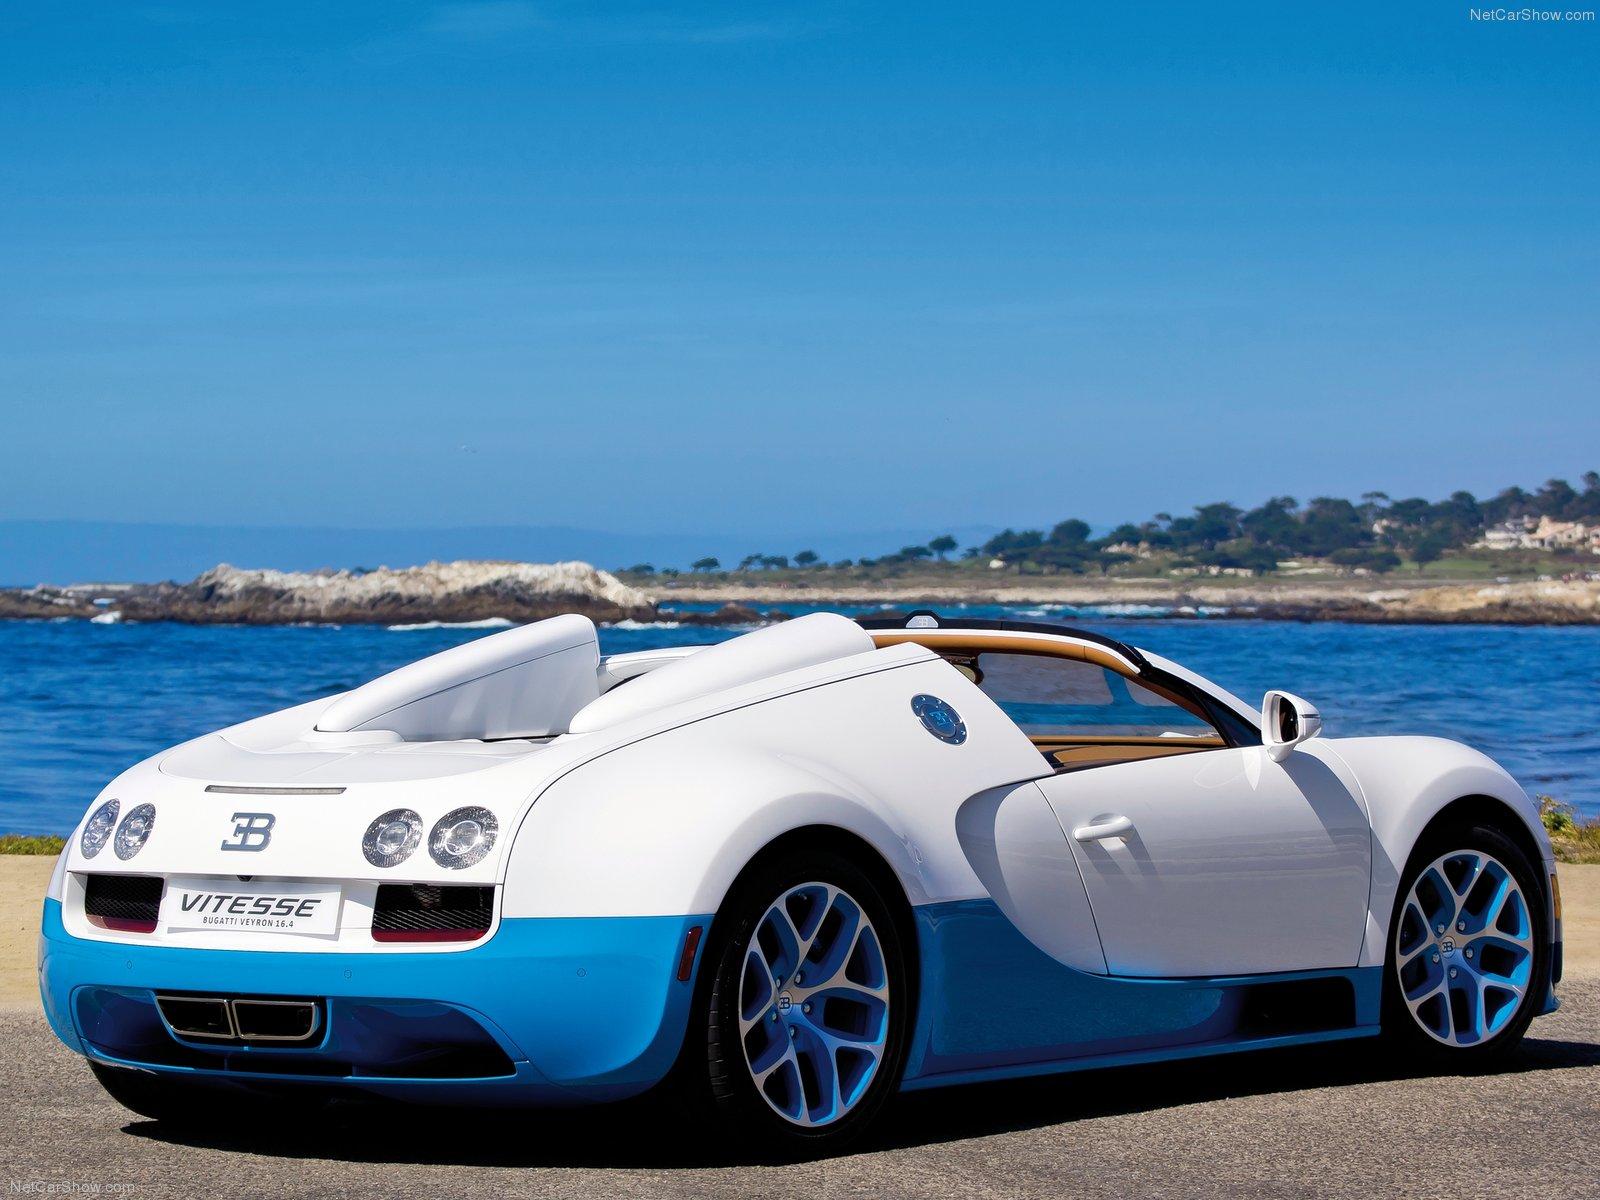 2012%2BBugatti%2BVeyron%2BGrand%2BSport%2BVitesse%2B%252843%2529 Astounding Xe Bugatti Veyron Grand Sport Vitesse Cars Trend